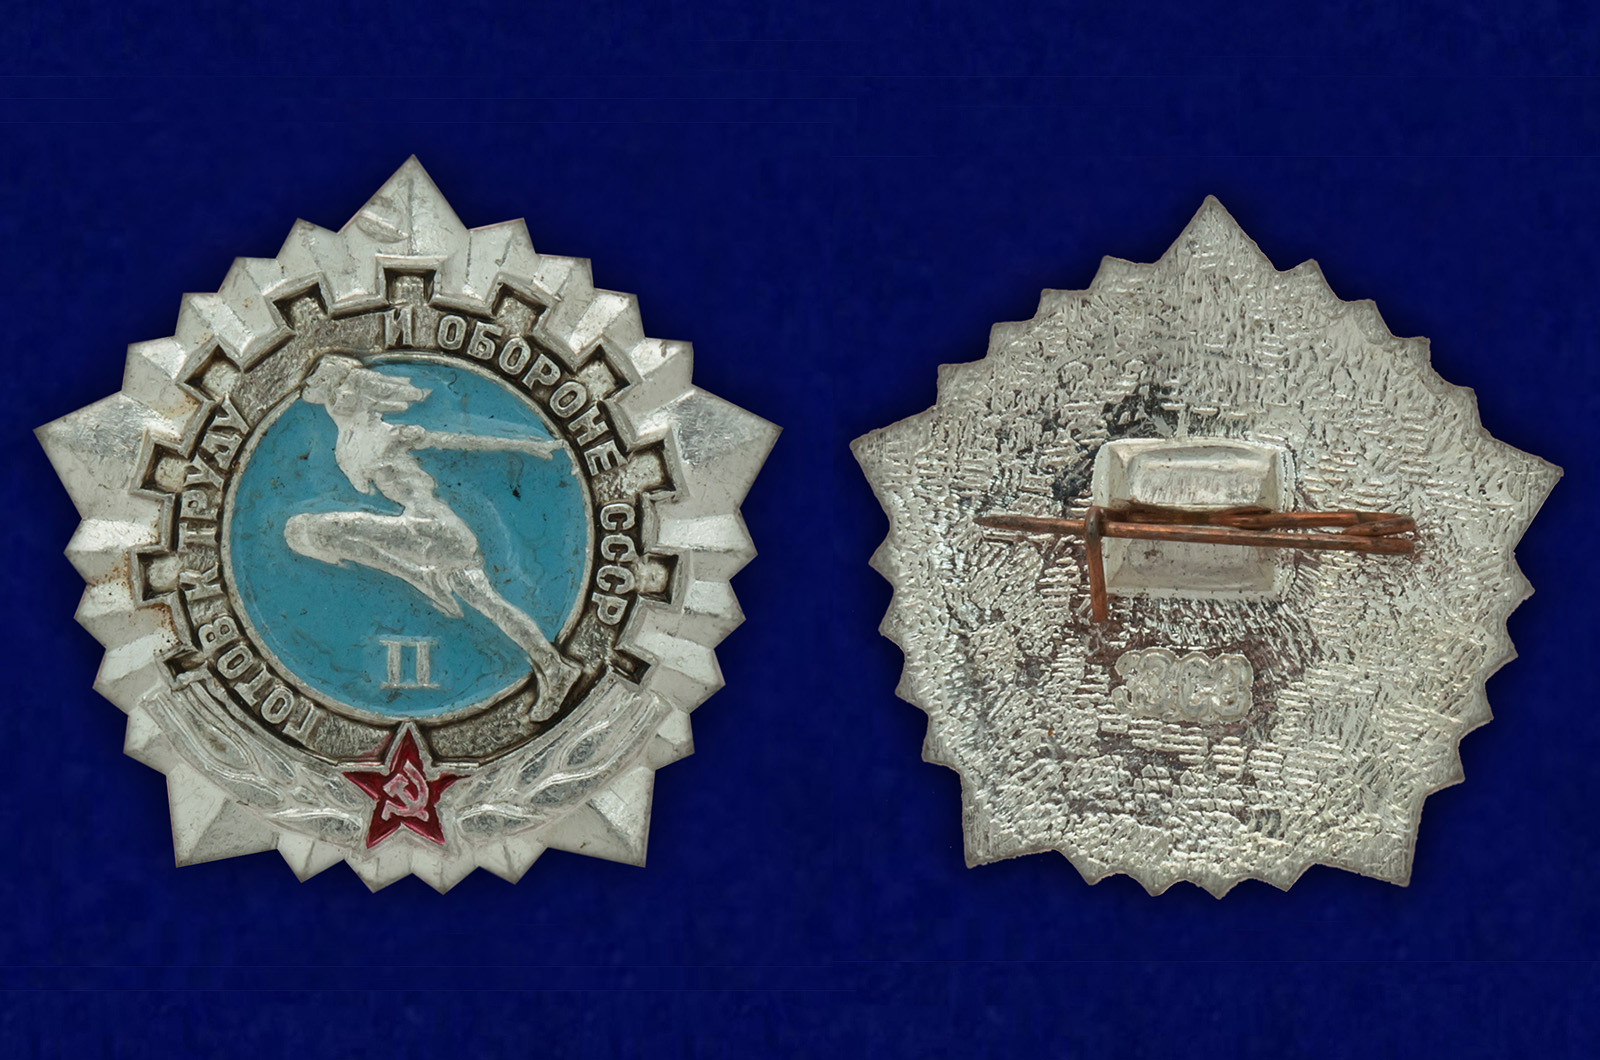 Значки ГТО 1972 года по низкой цене